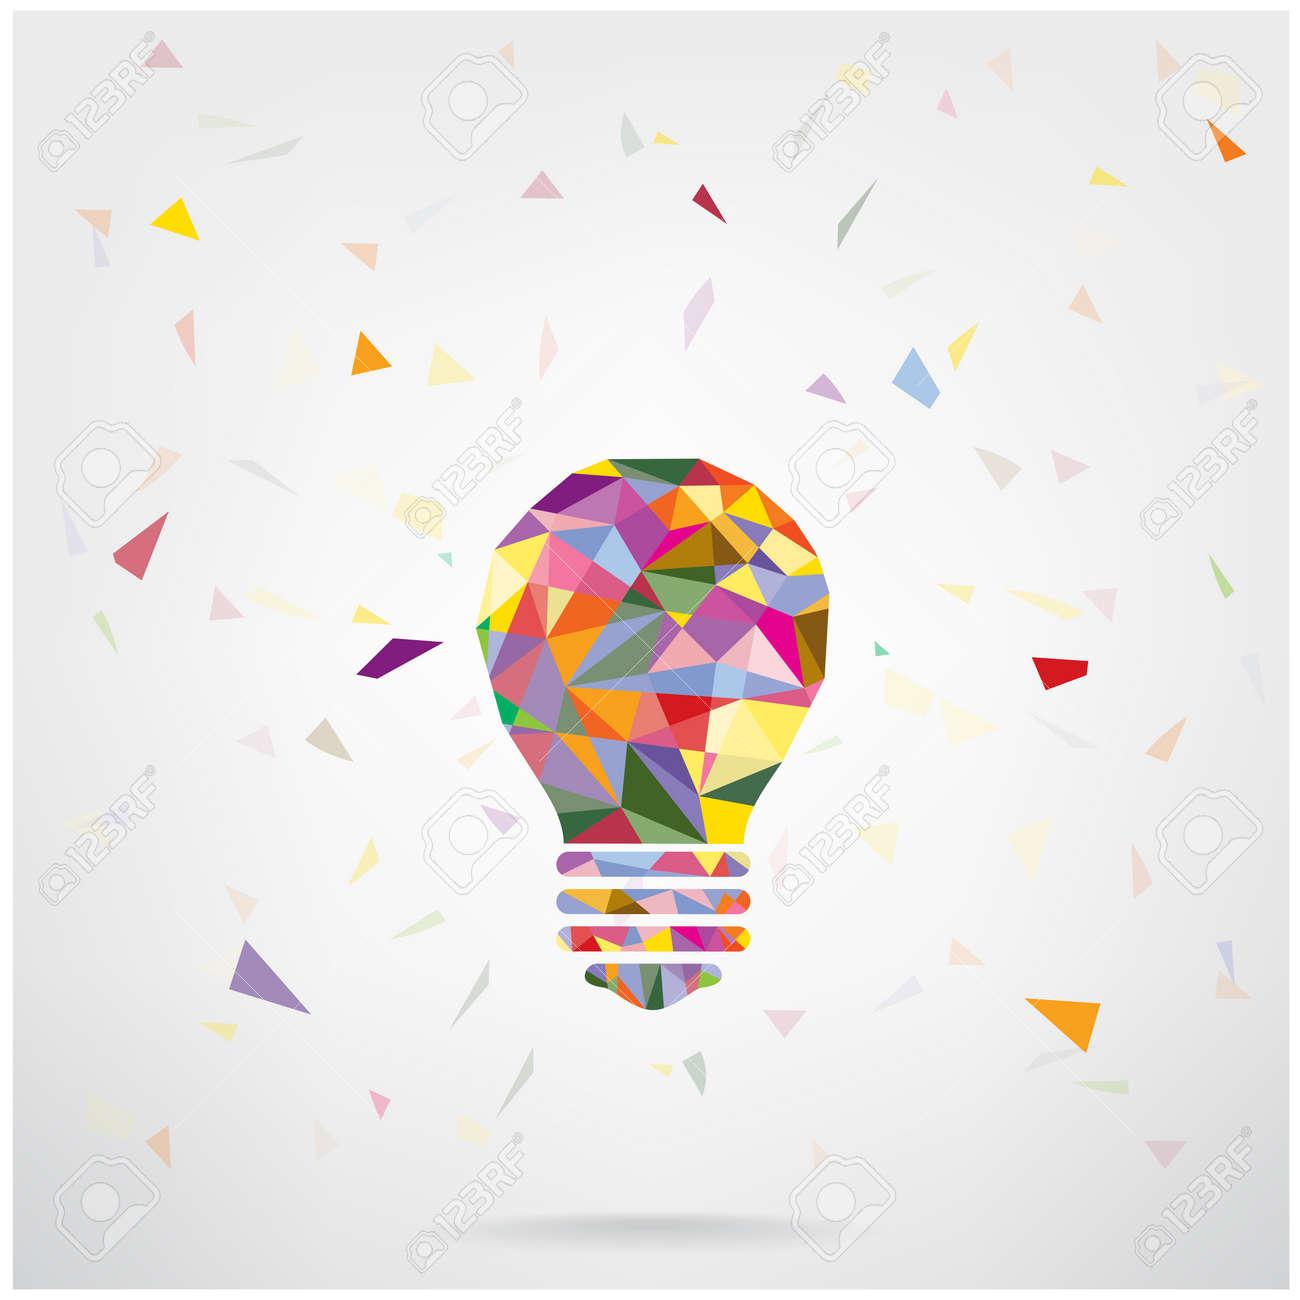 creative light bulb idea concept background design for poster